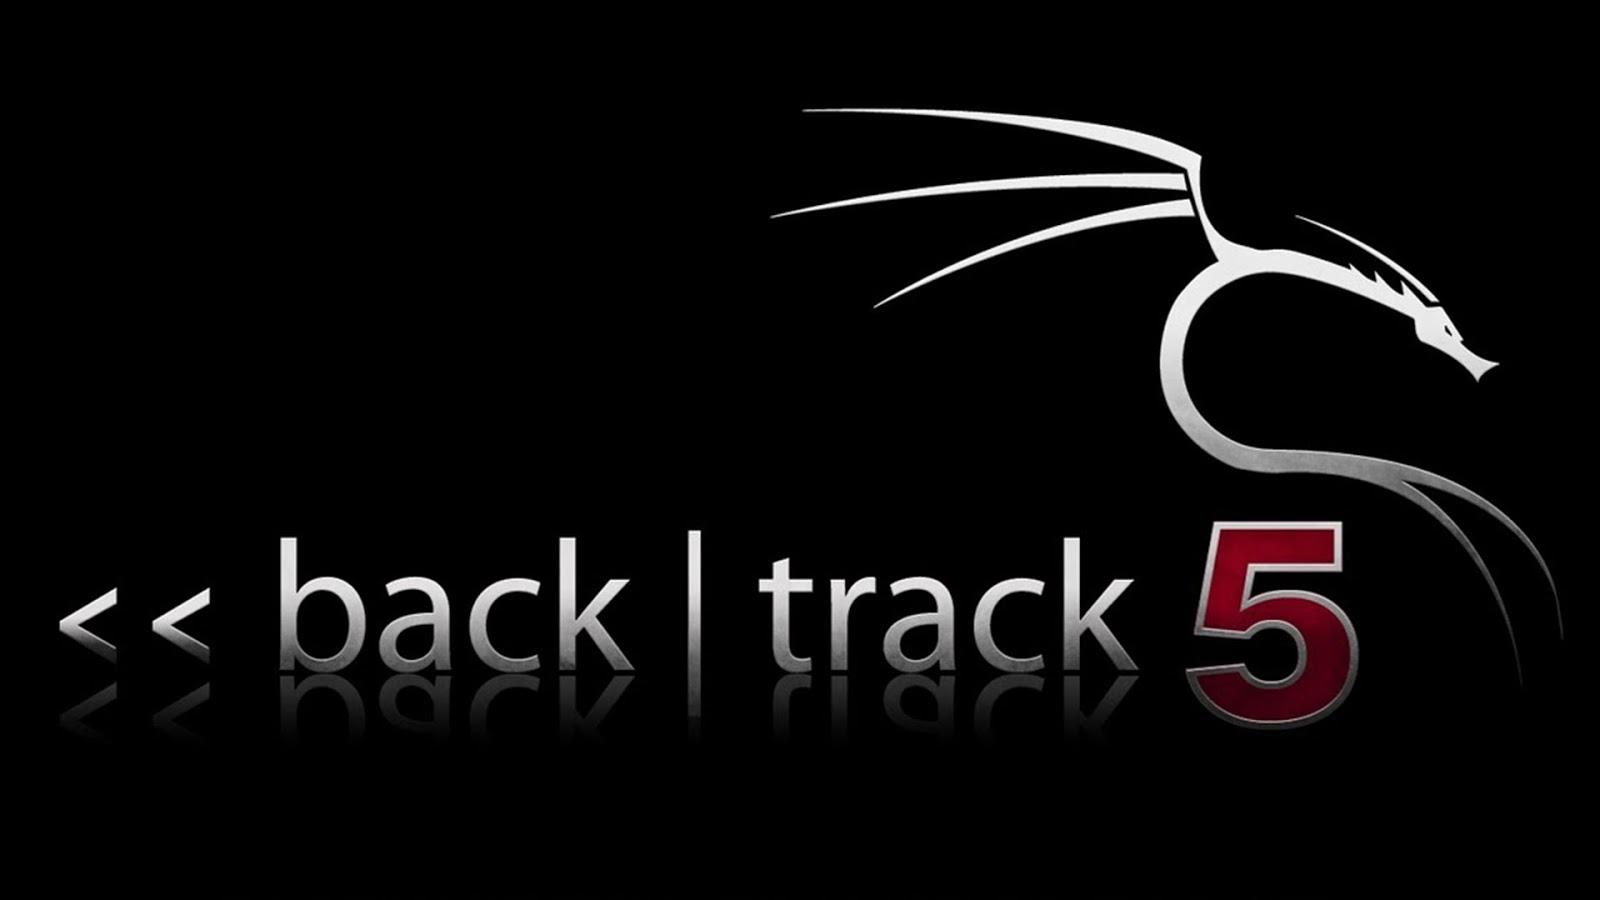 Ebook Backtrack 5 R3 Bahasa Indonesia